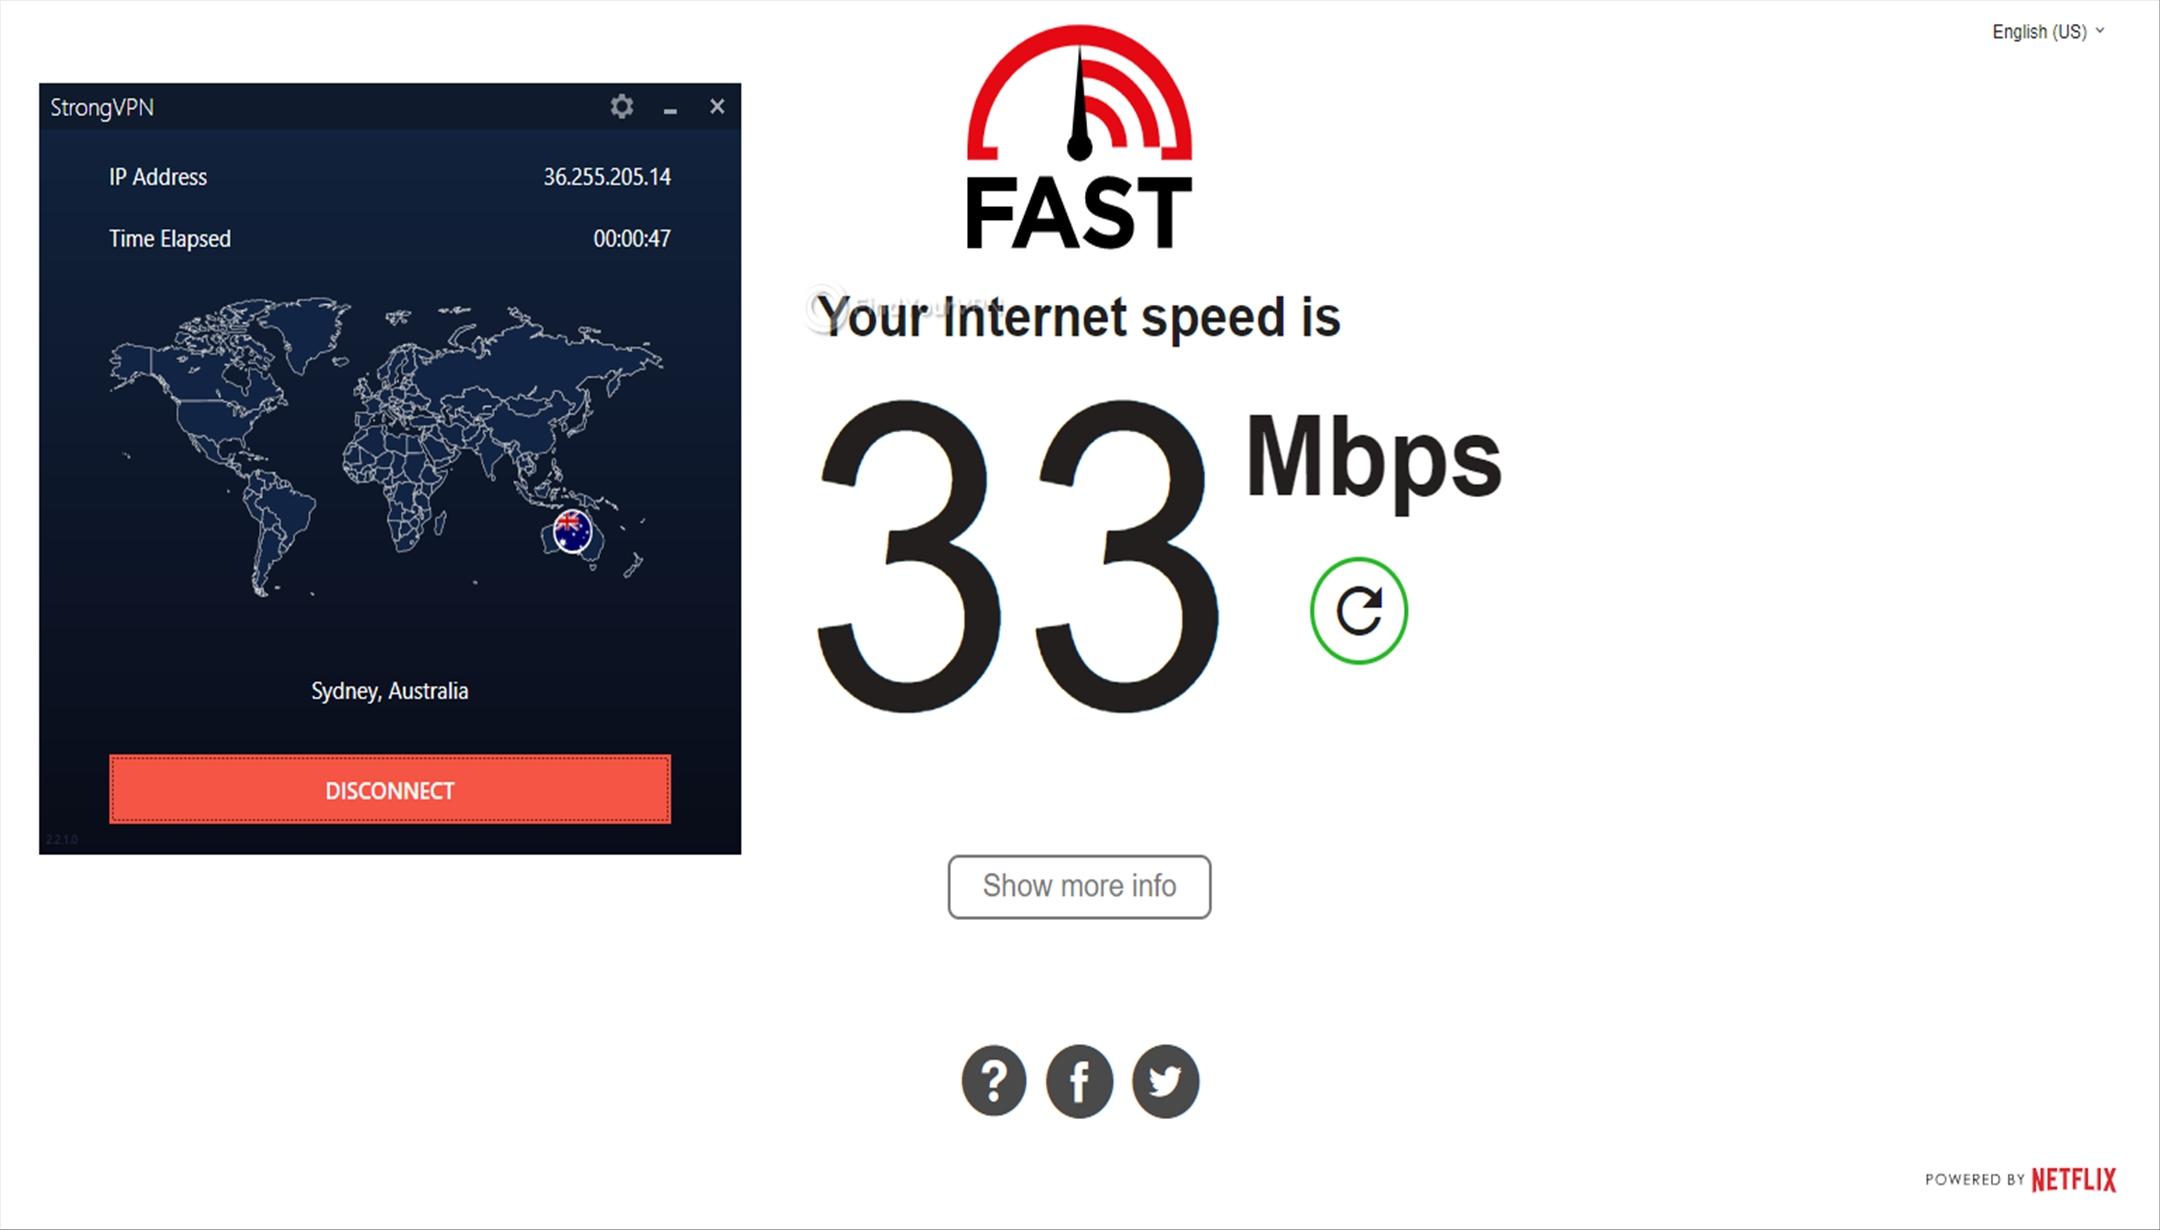 Speed test results for StrongVPN's Australia servers